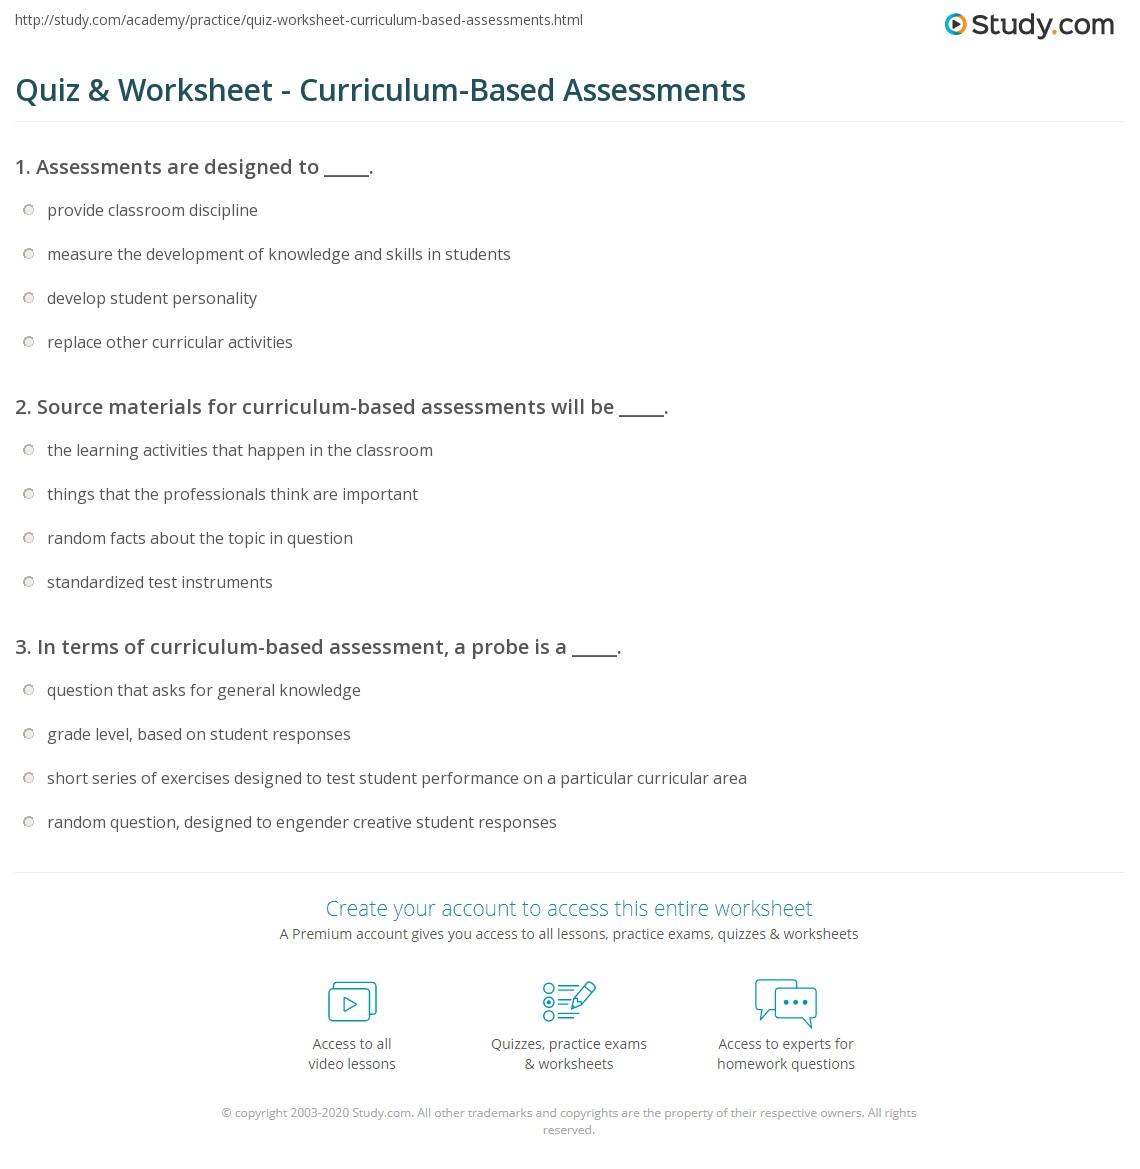 Quiz & Worksheet - Curriculum-Based Assessments | Study.com